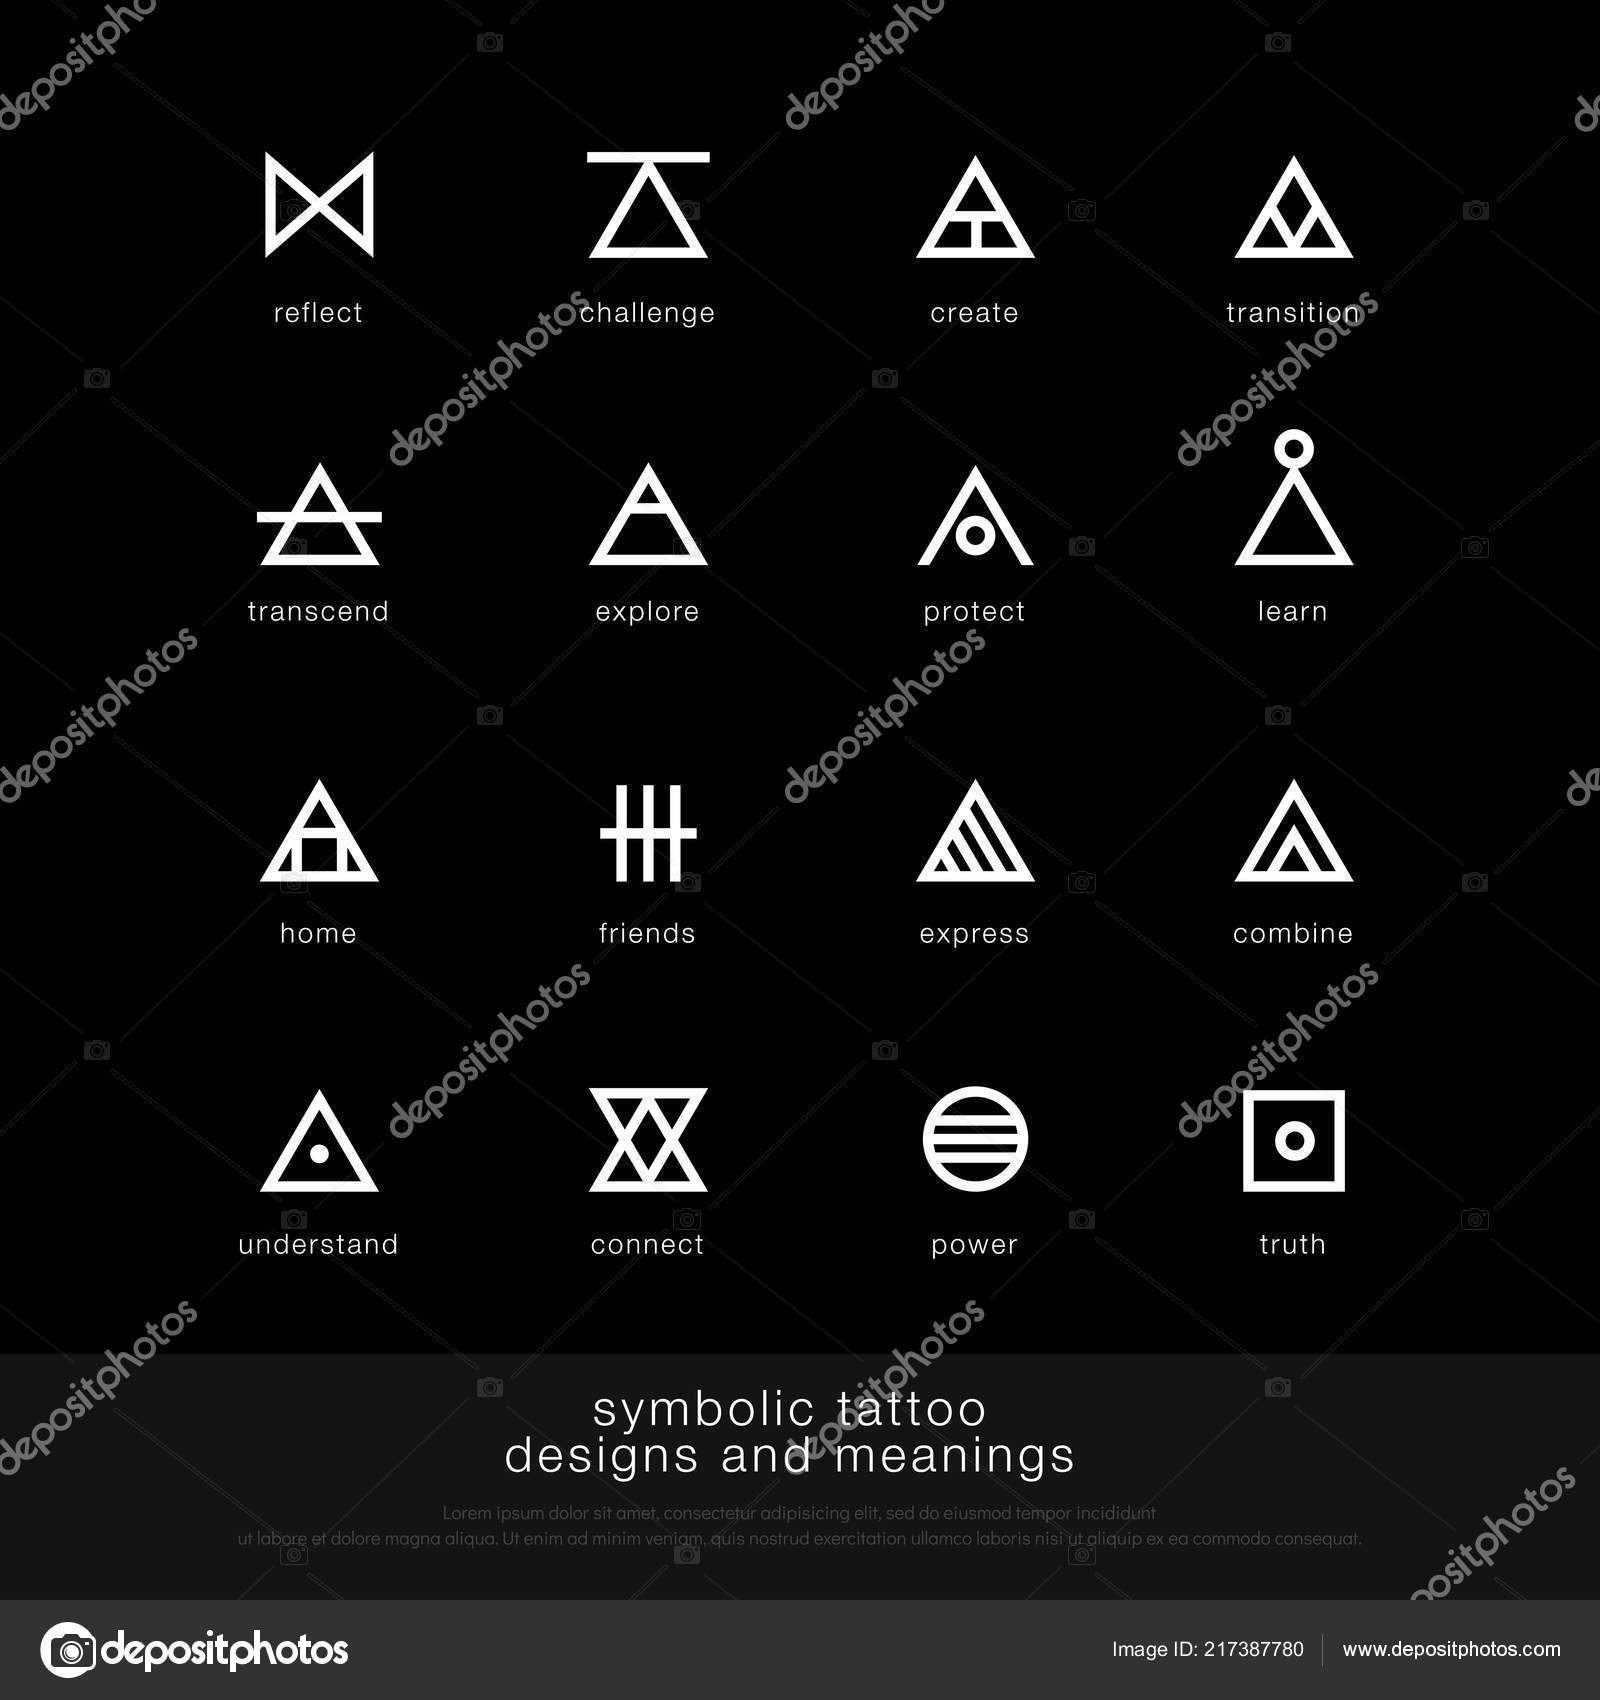 Symbolic Tattoo Design Meaning Minimalist Graphic Tattoo Icon Symbol